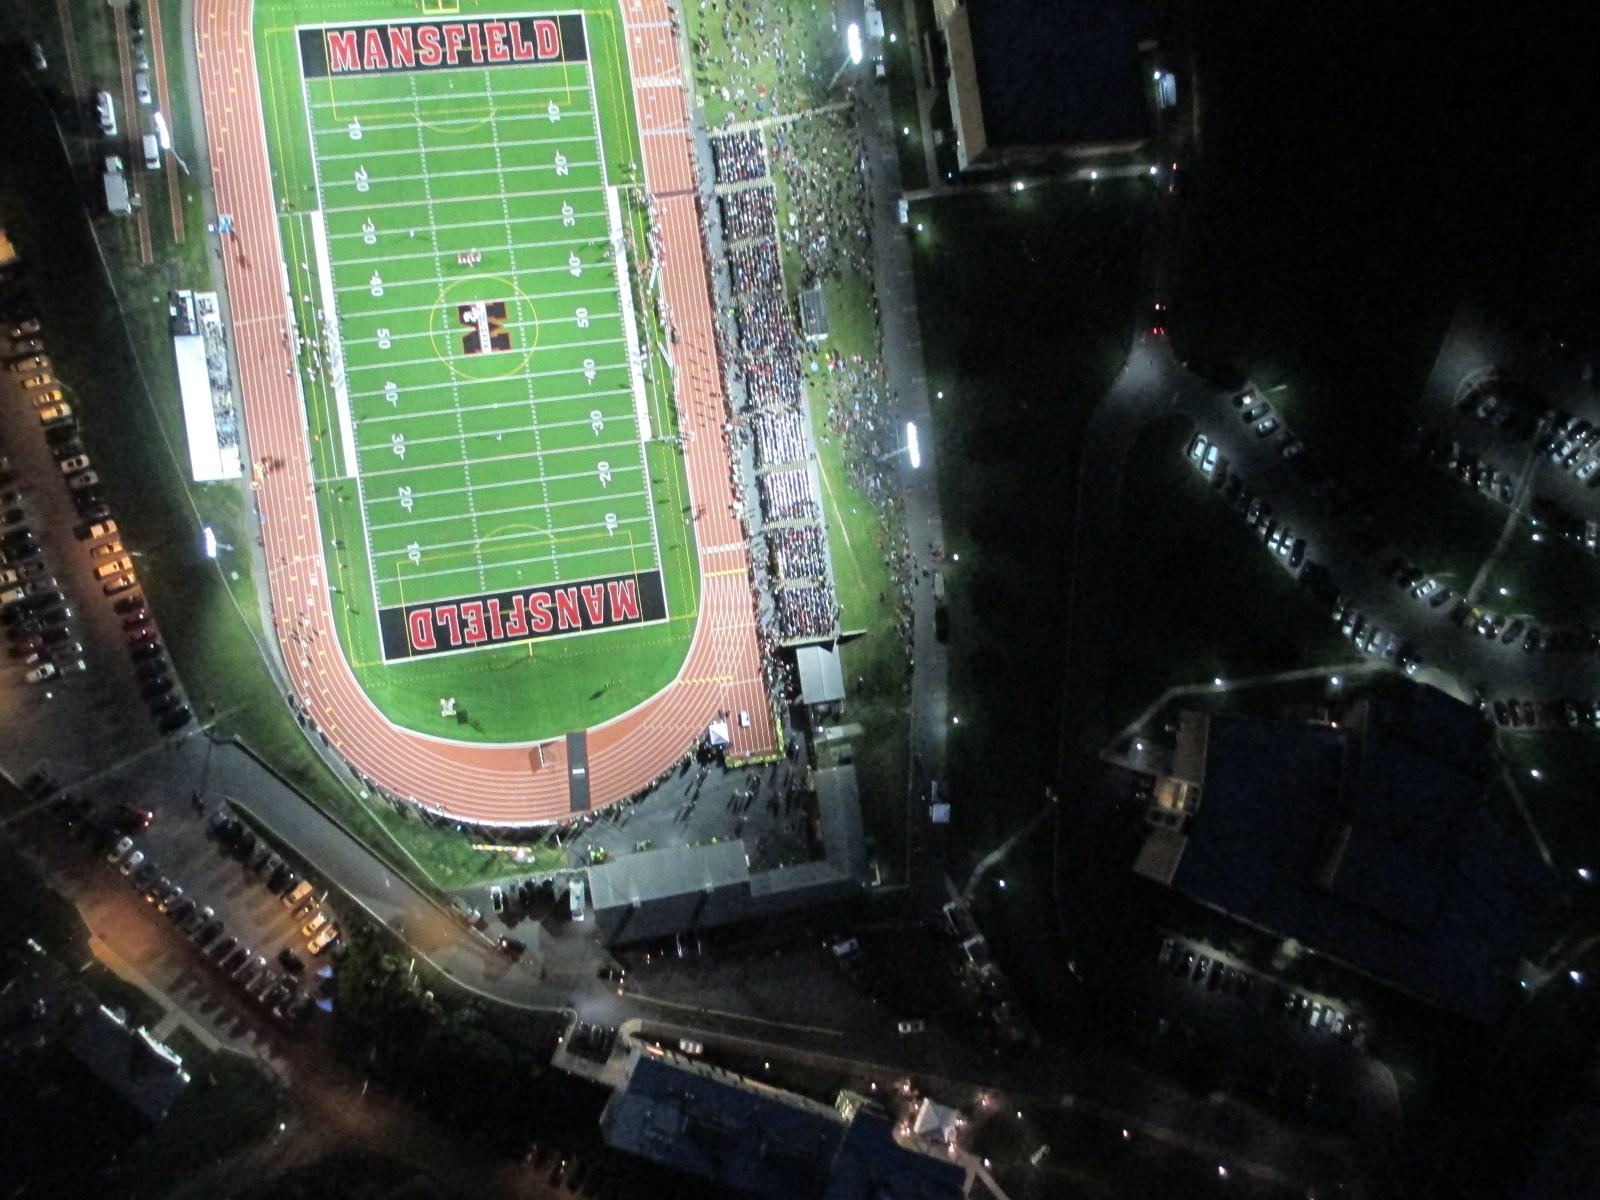 mansfield-football-stadium-after-dark